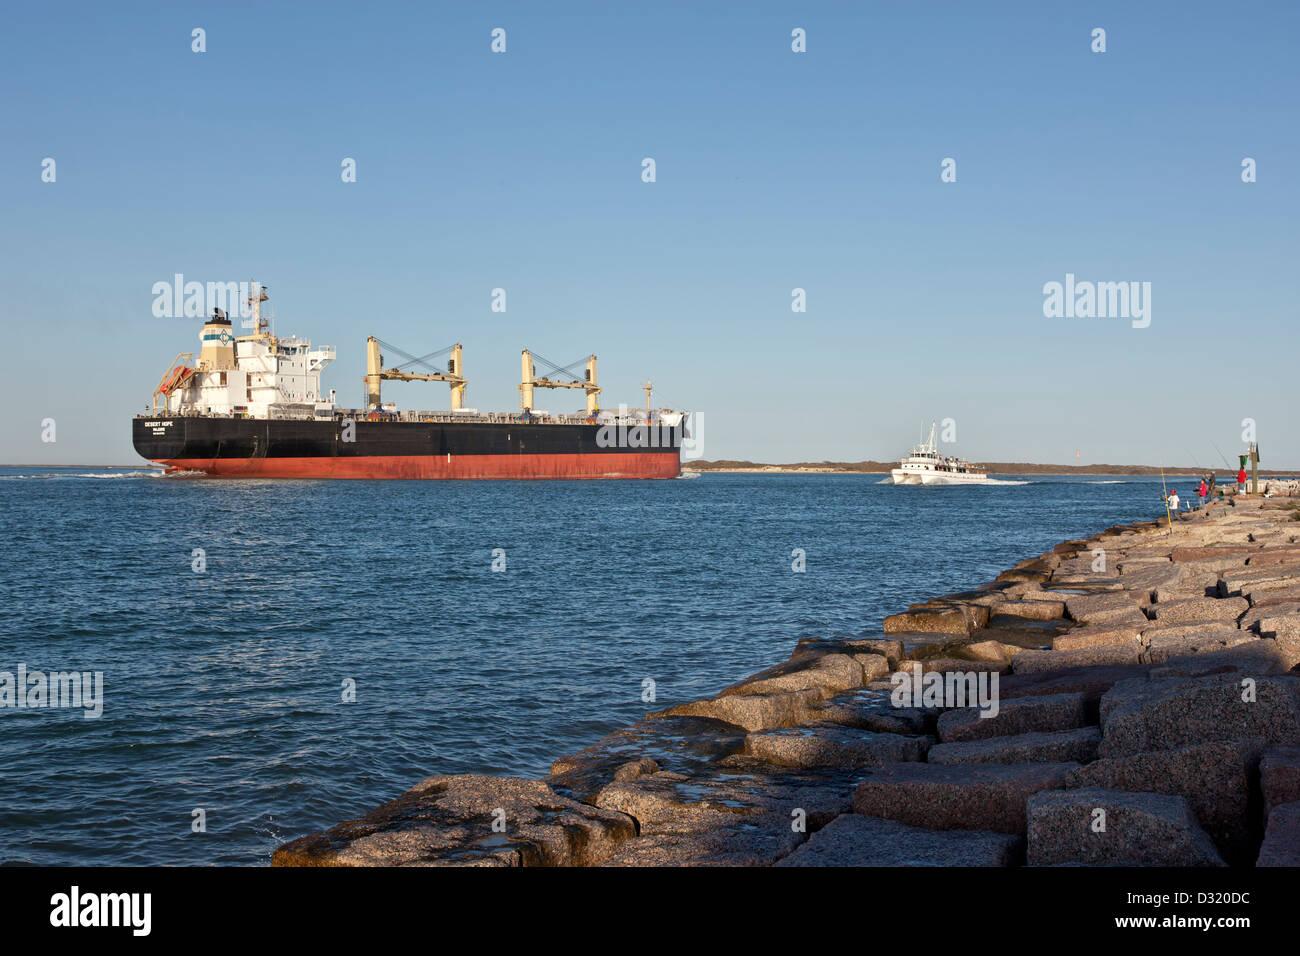 Freighter le transport du grain, Corpus Christi ship channel. Photo Stock